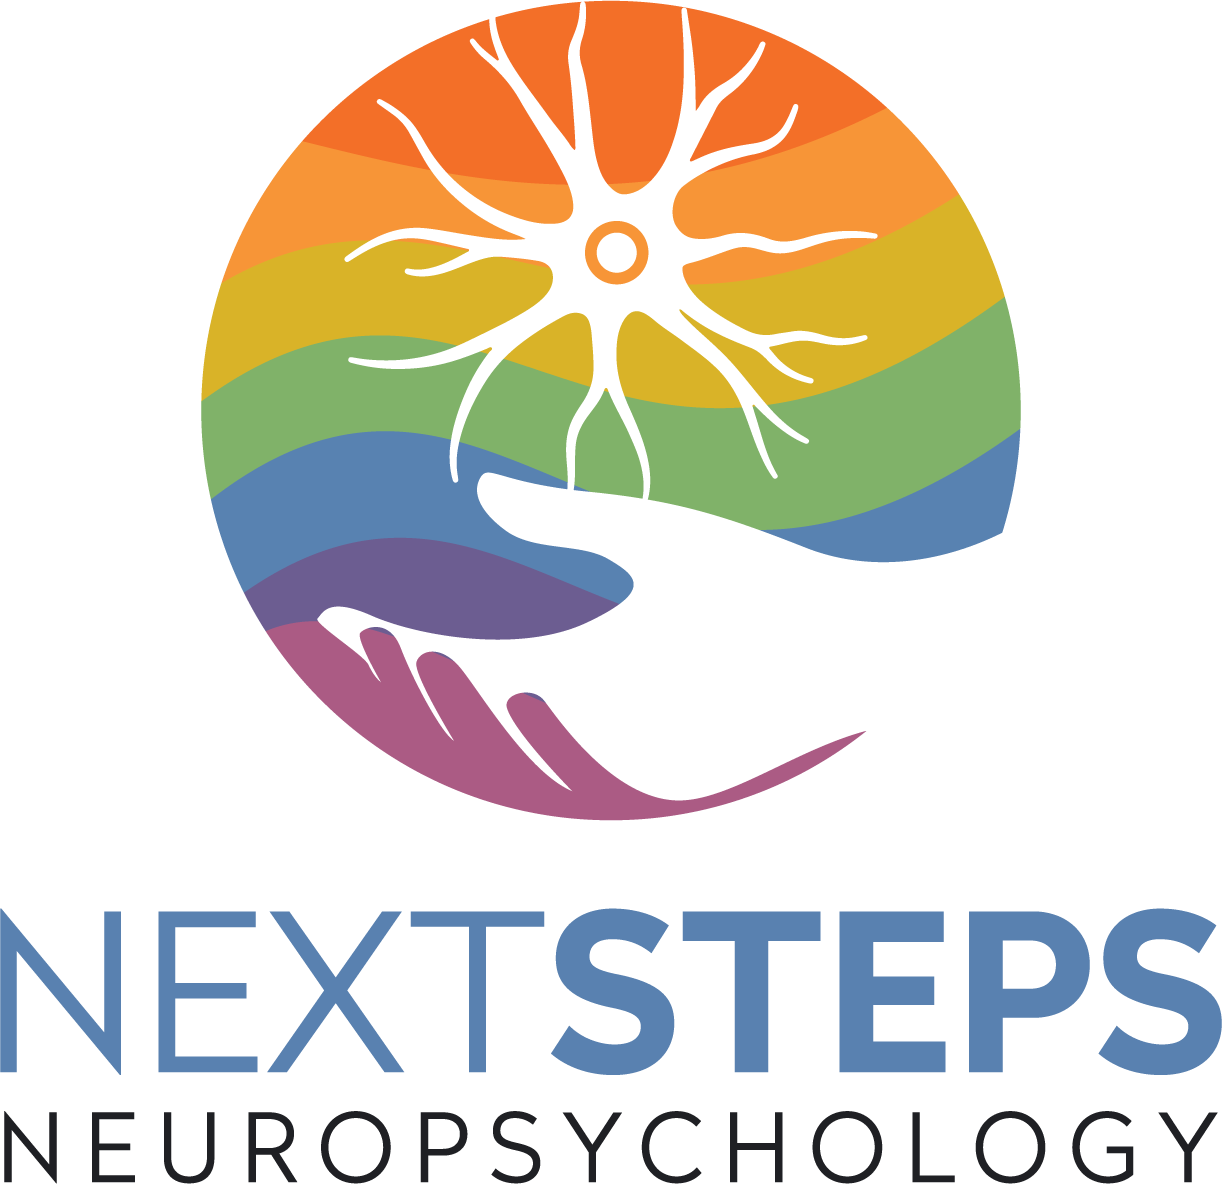 Next Steps Neuropsychology